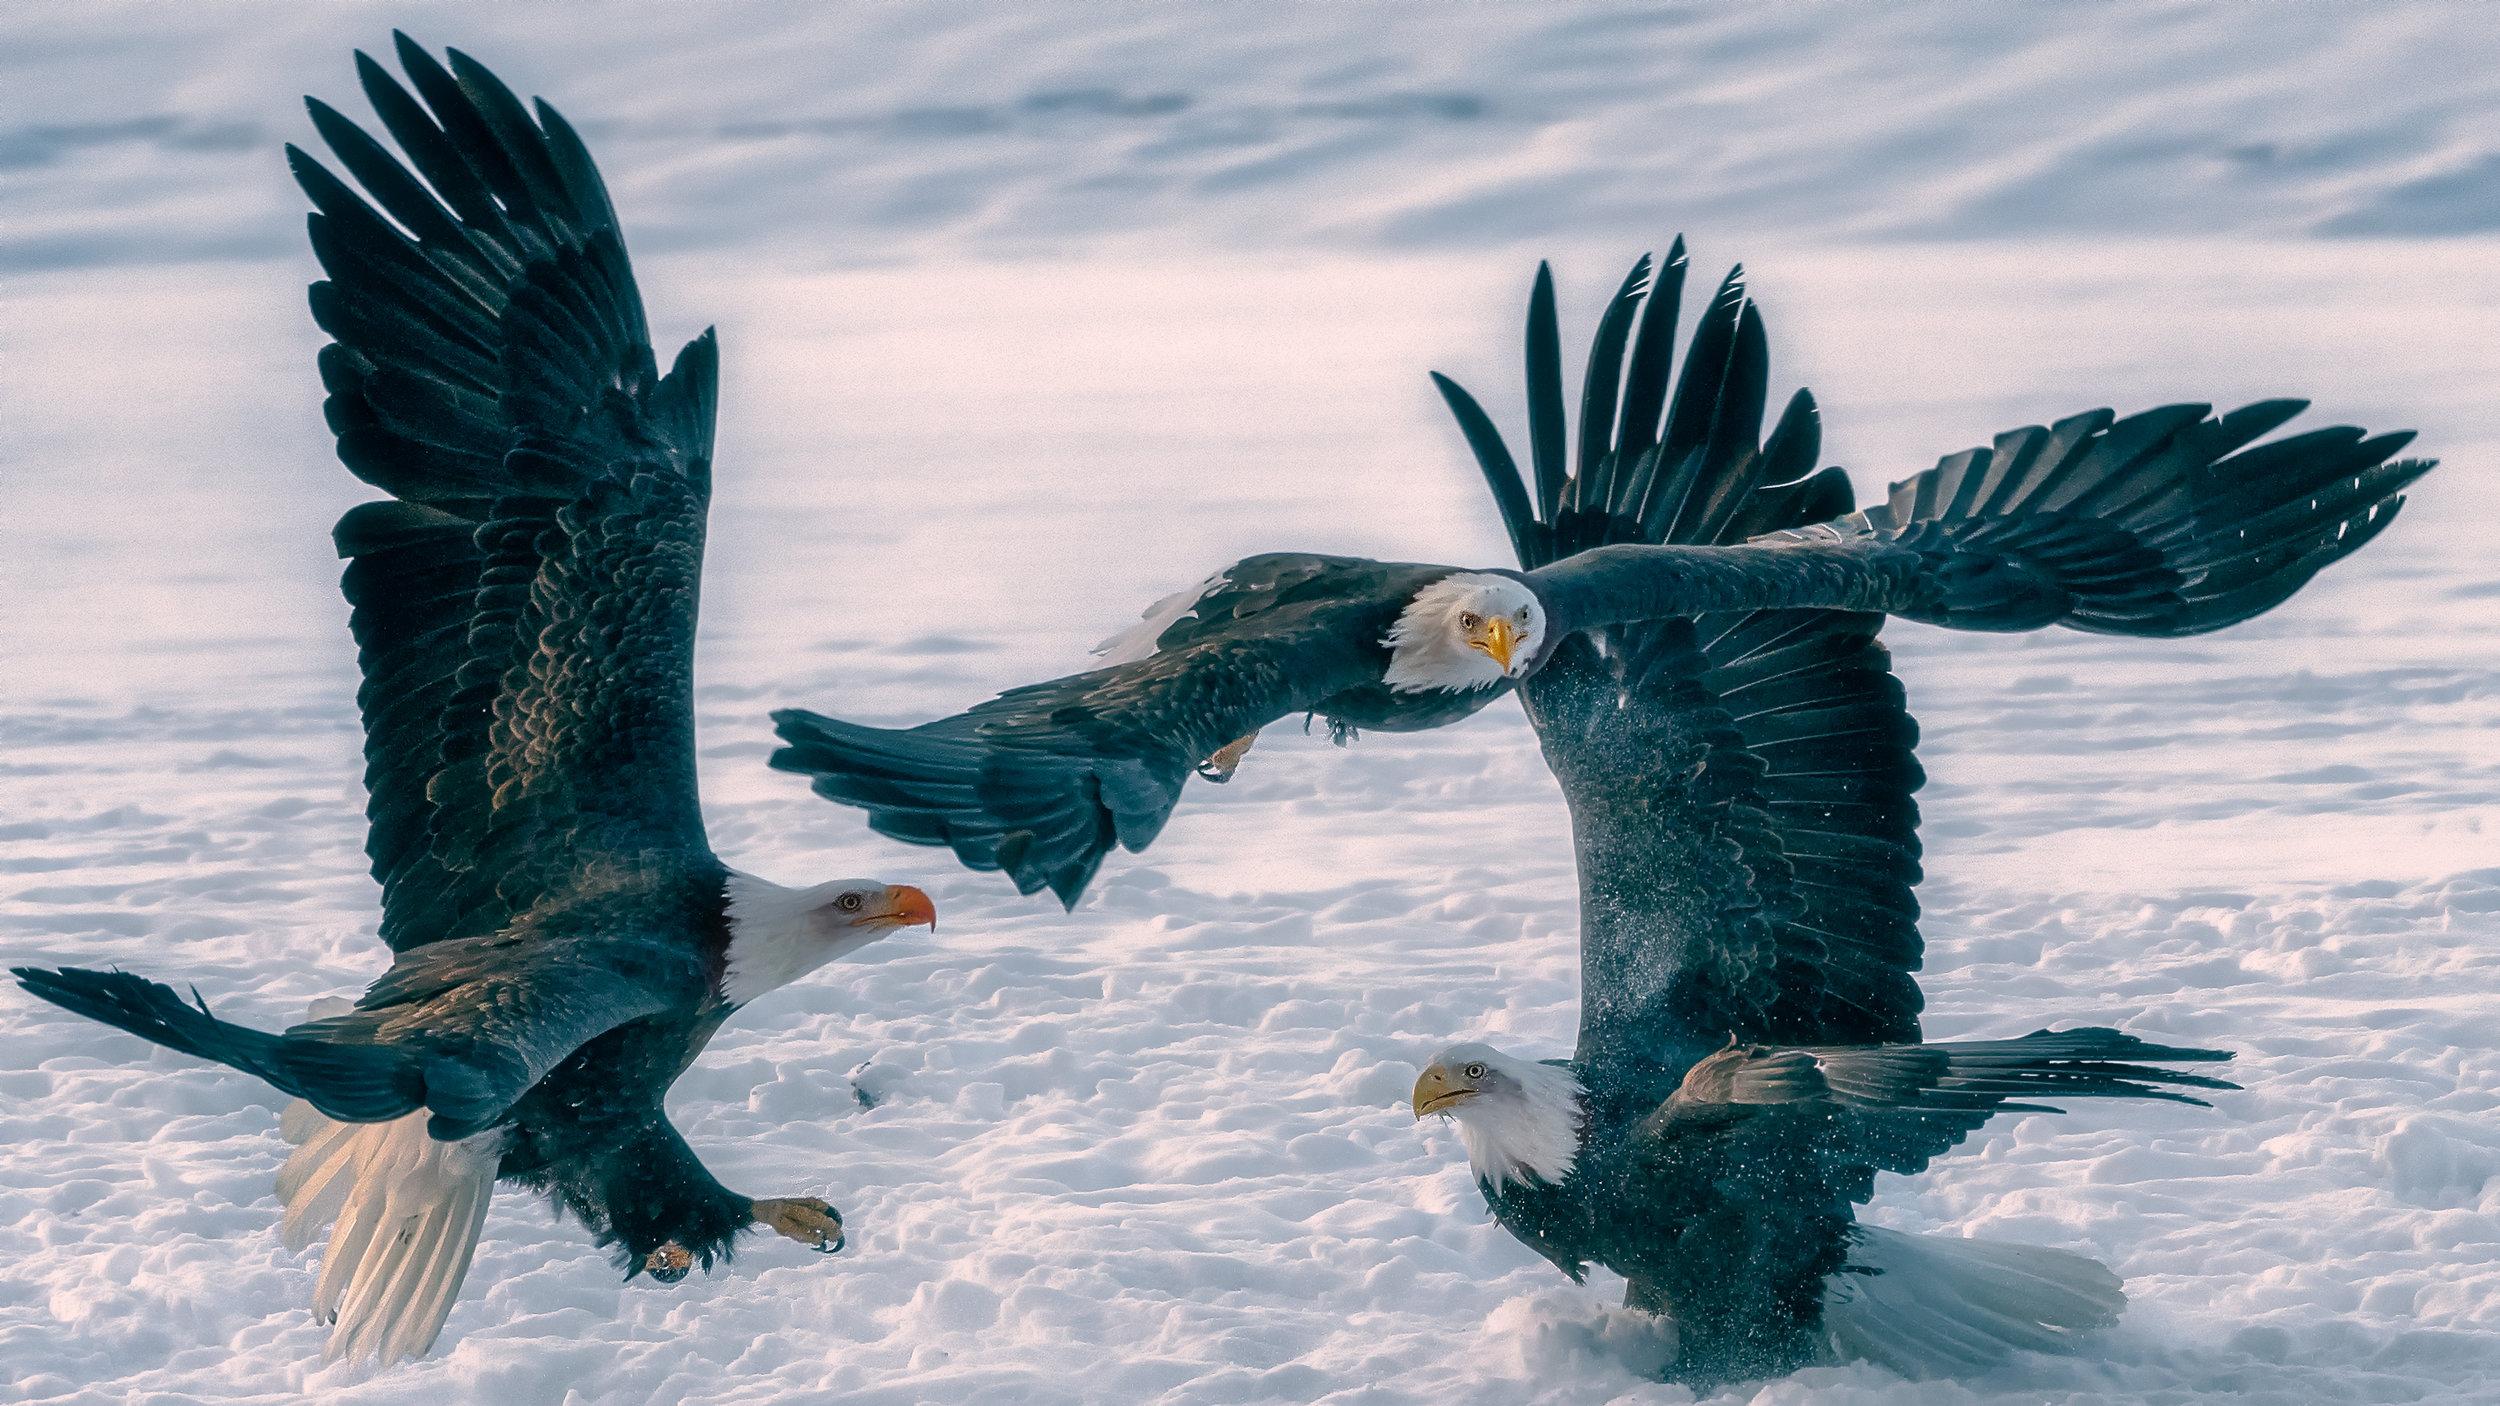 K. EaglePortfolio_Image_11_©BrianRiveraUncapher.jpg